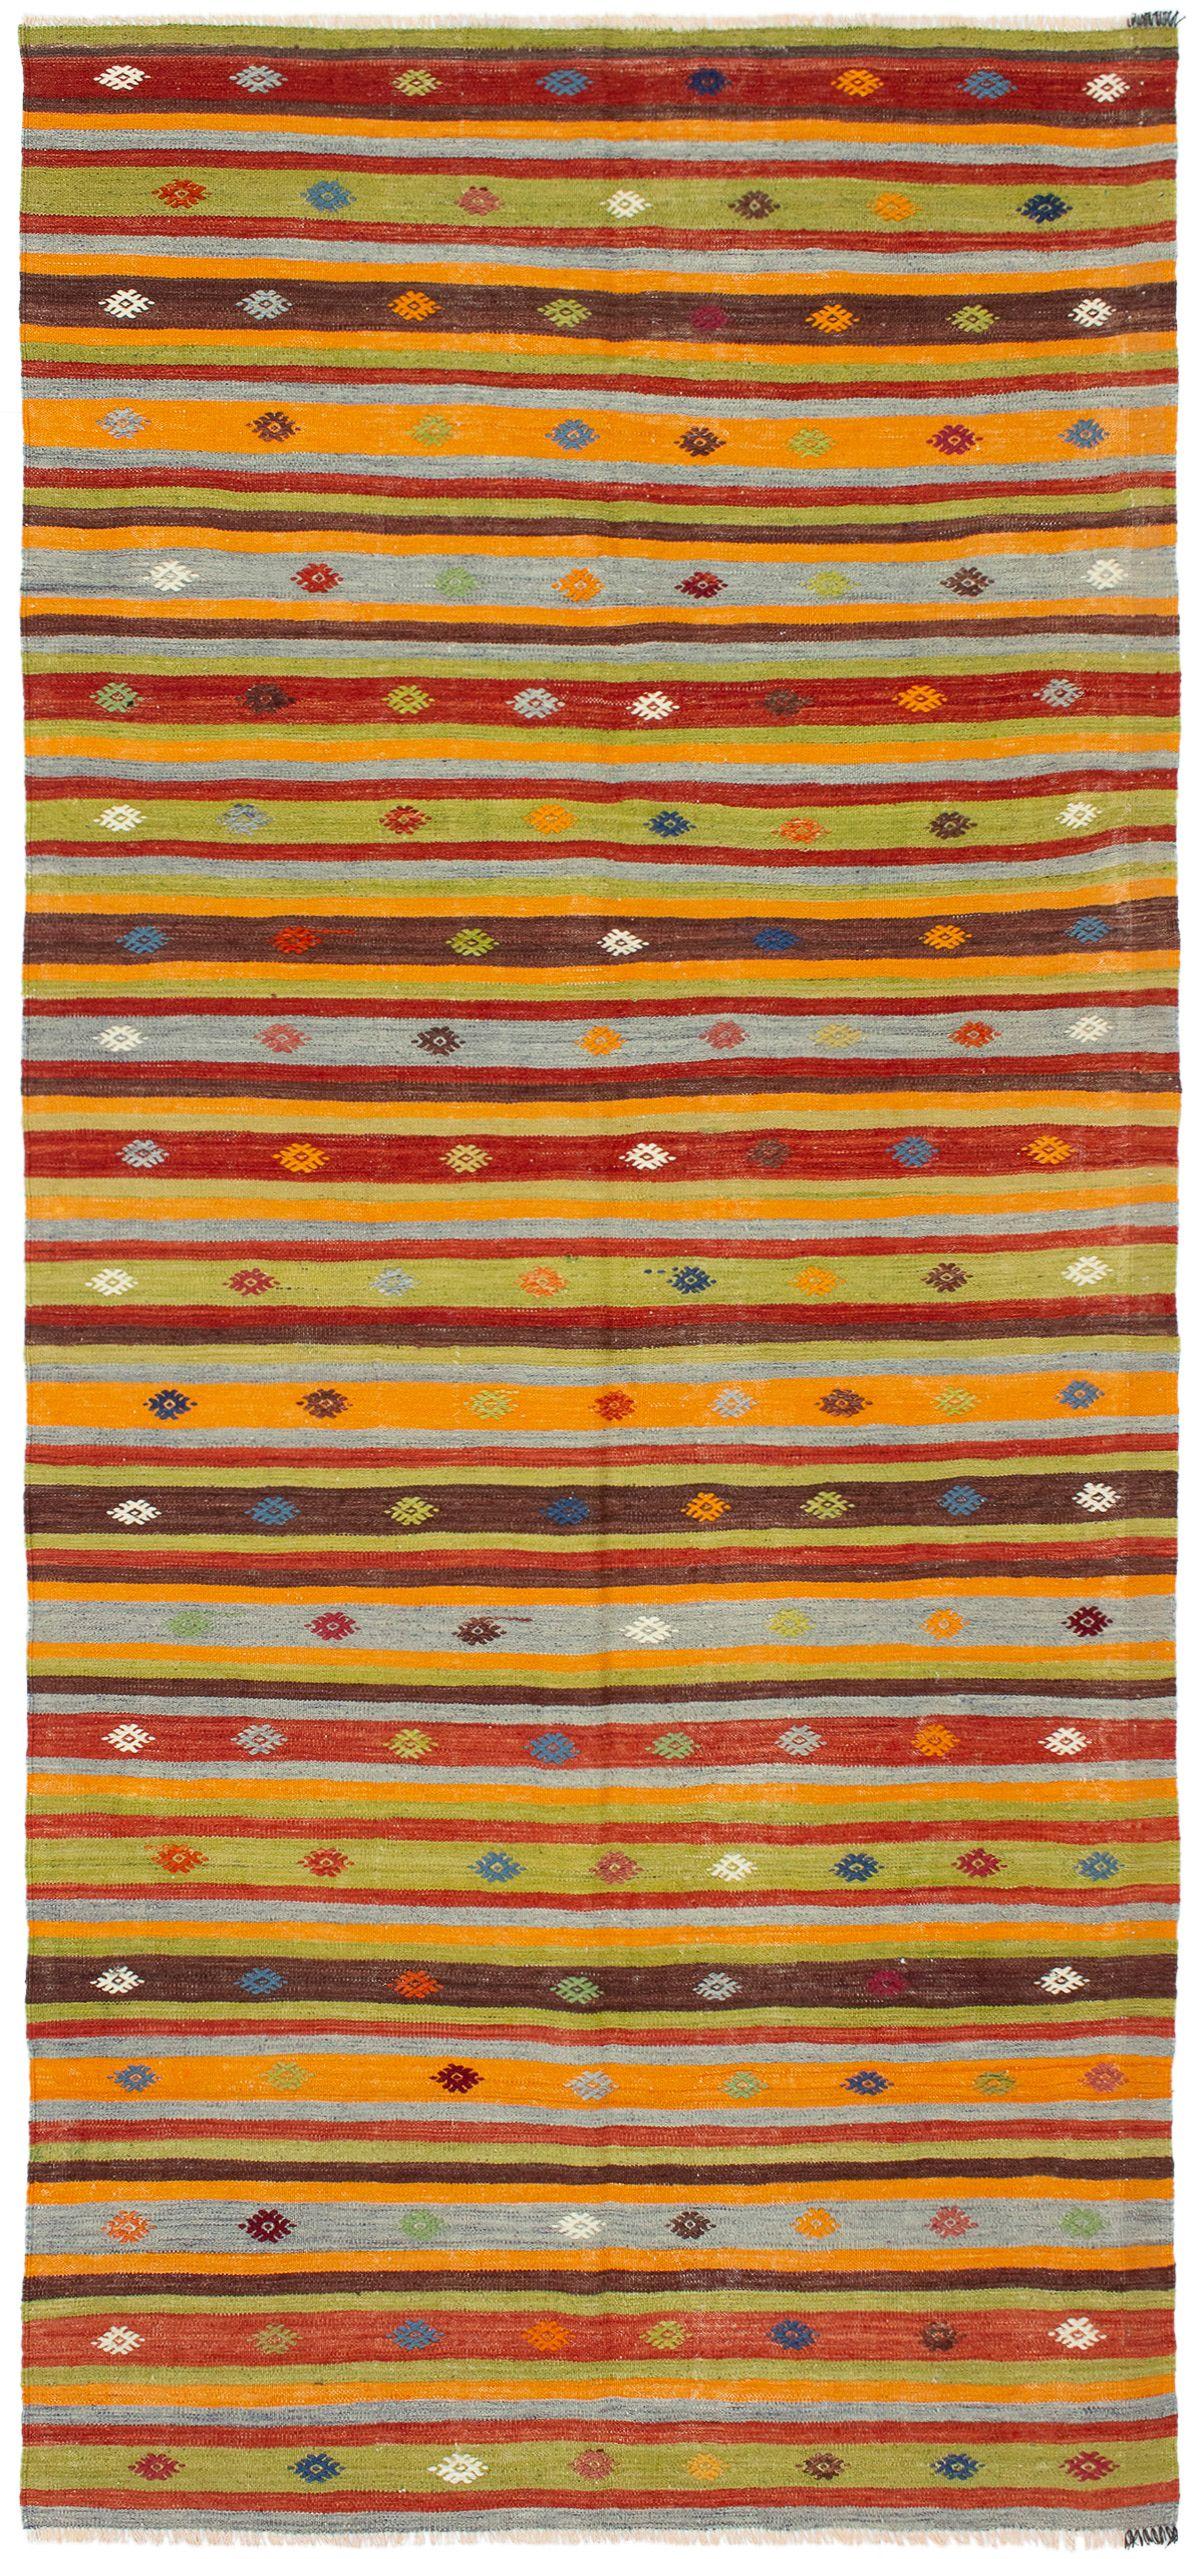 "Hand woven Bohemian Orange, Red Wool Kilim 4'9"" x 10'2"" Size: 4'9"" x 10'2"""